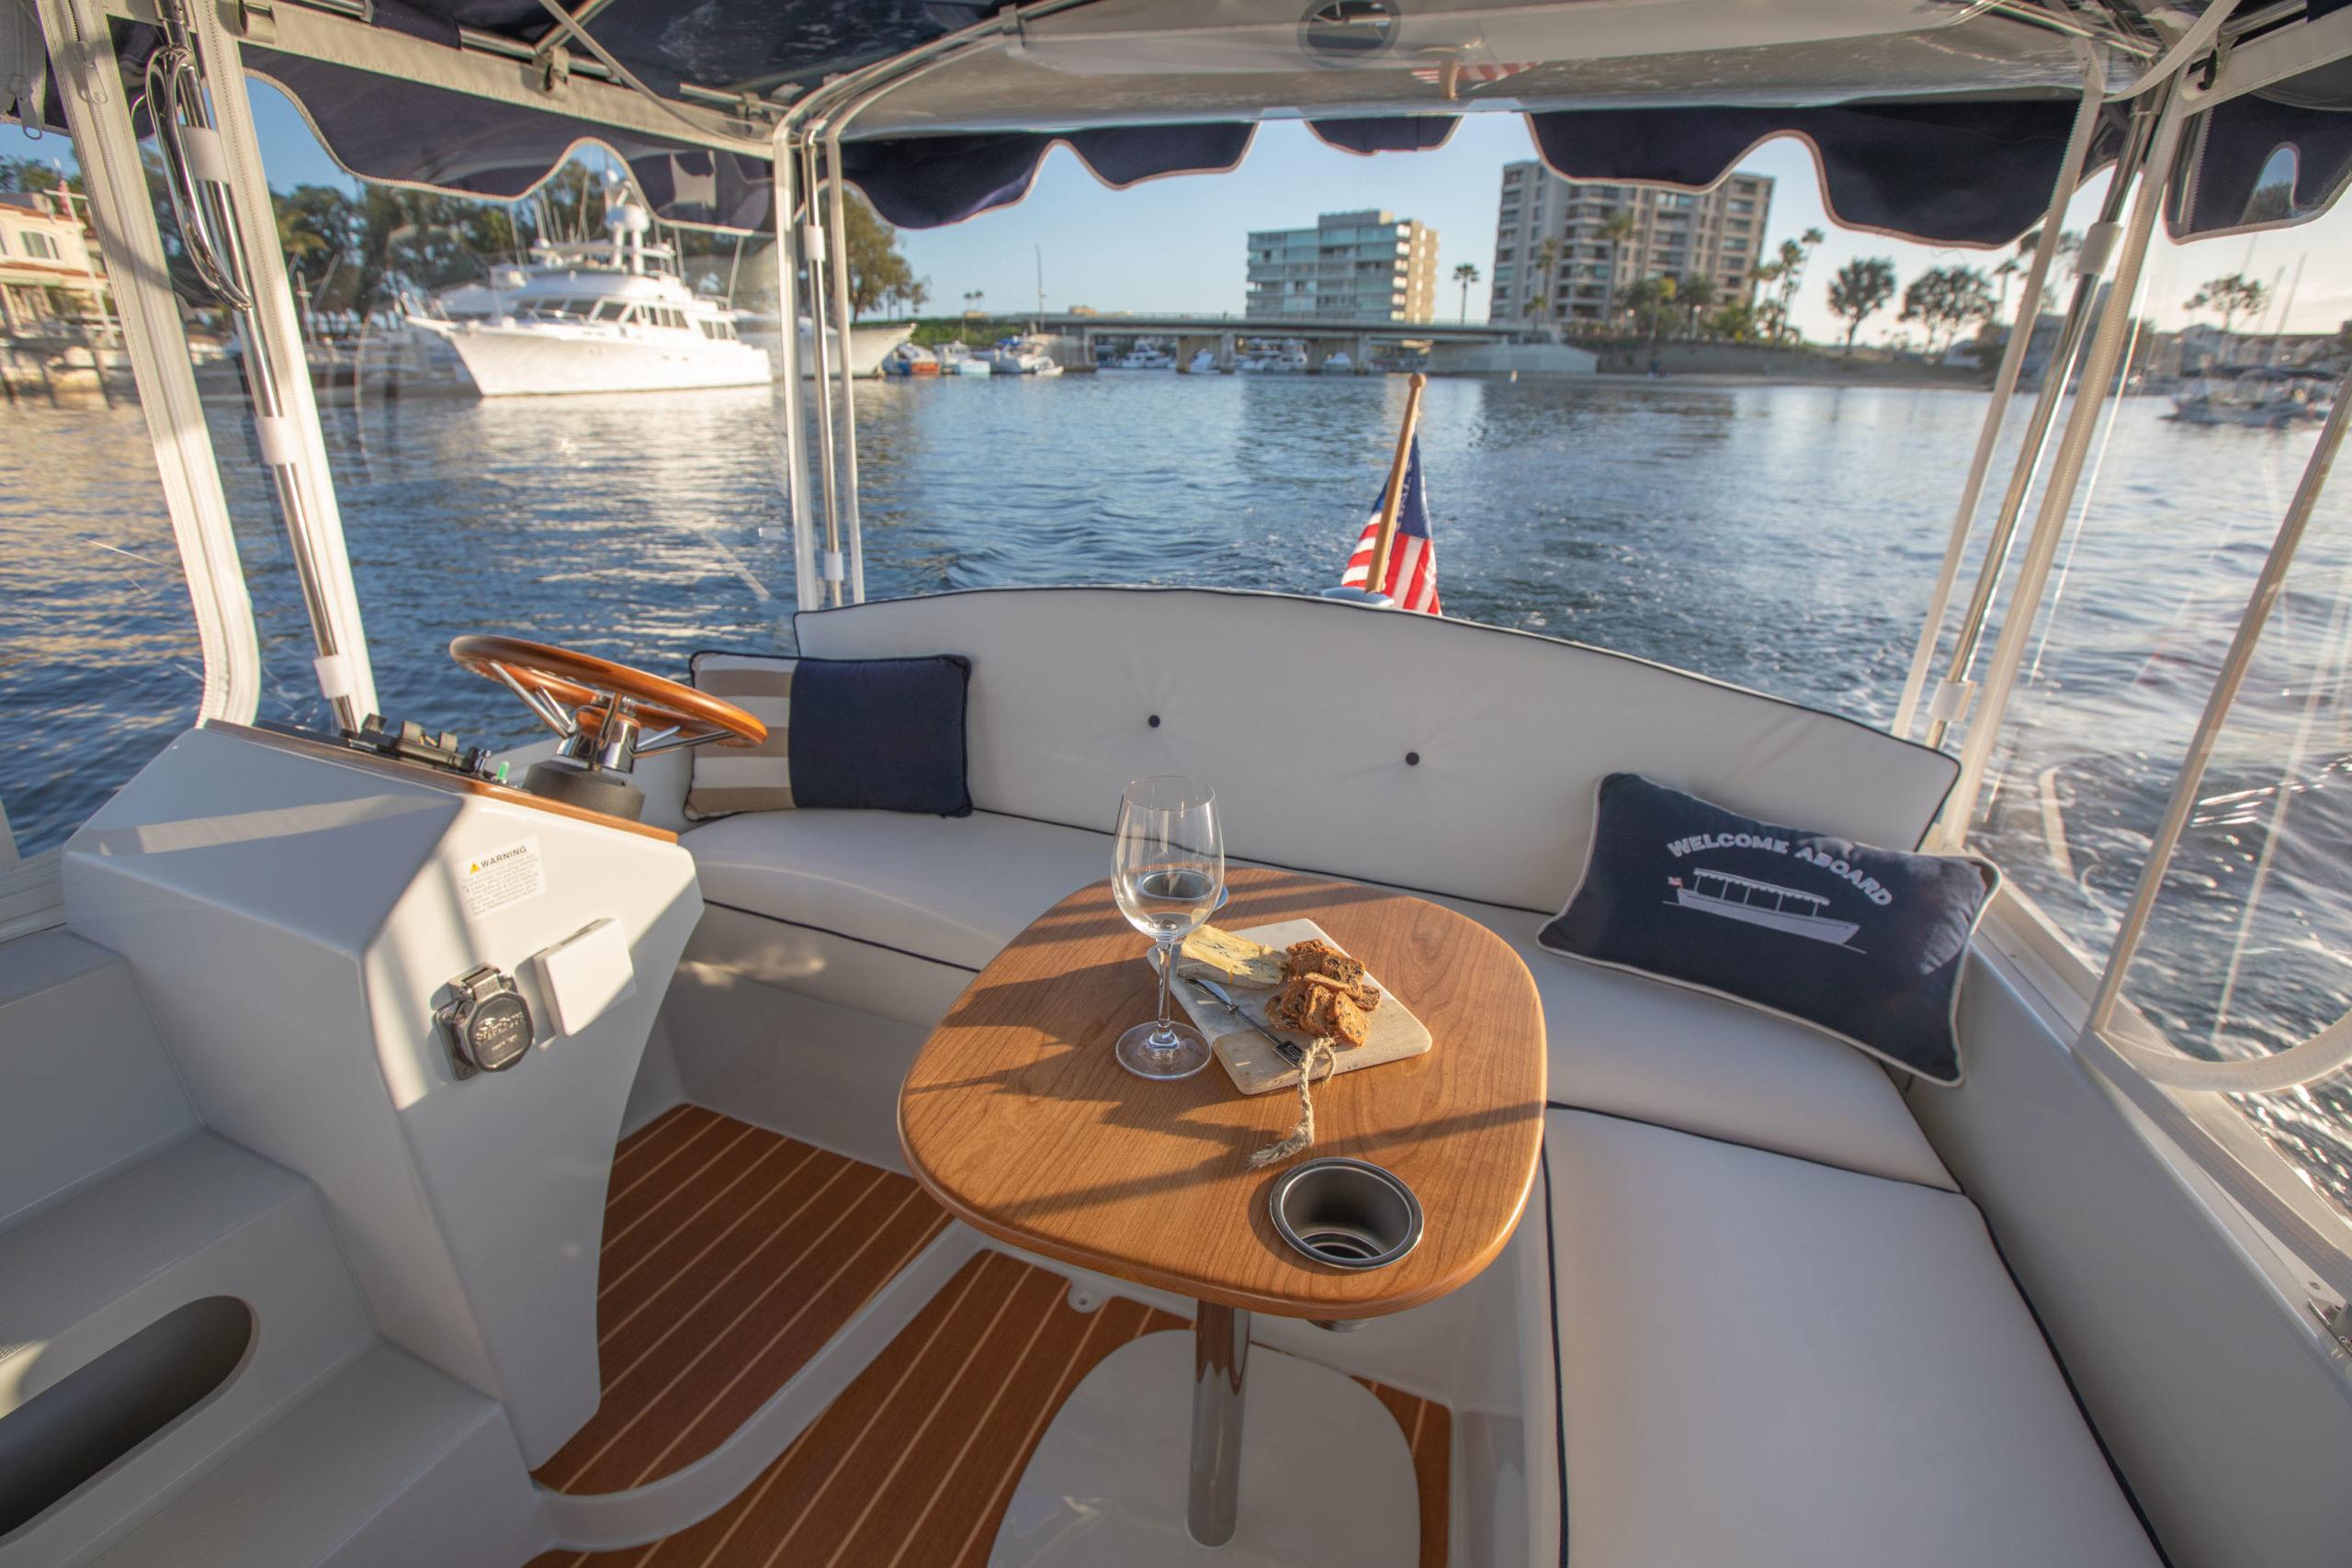 Duffy-Electric-Boats-18-Snug-Harbor-Interior-2020-22